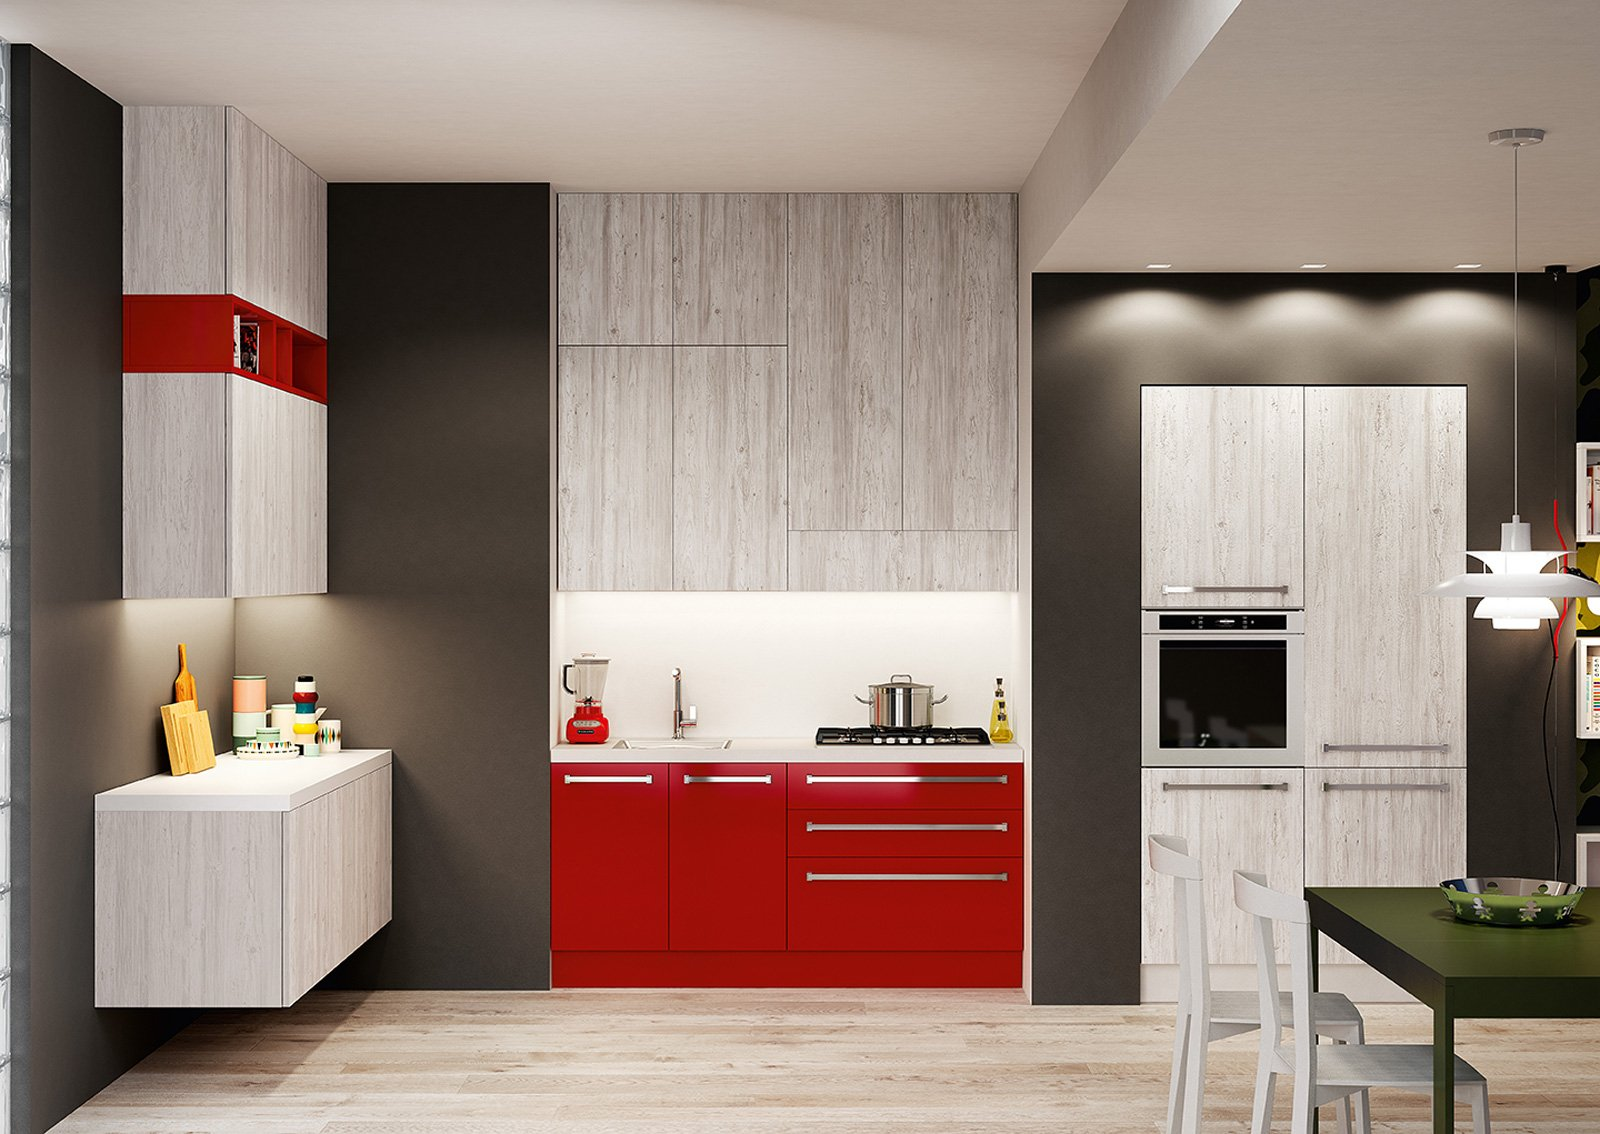 Piccole Cucine Moderne. Perfect Piccole Cucine Funzionali E ...